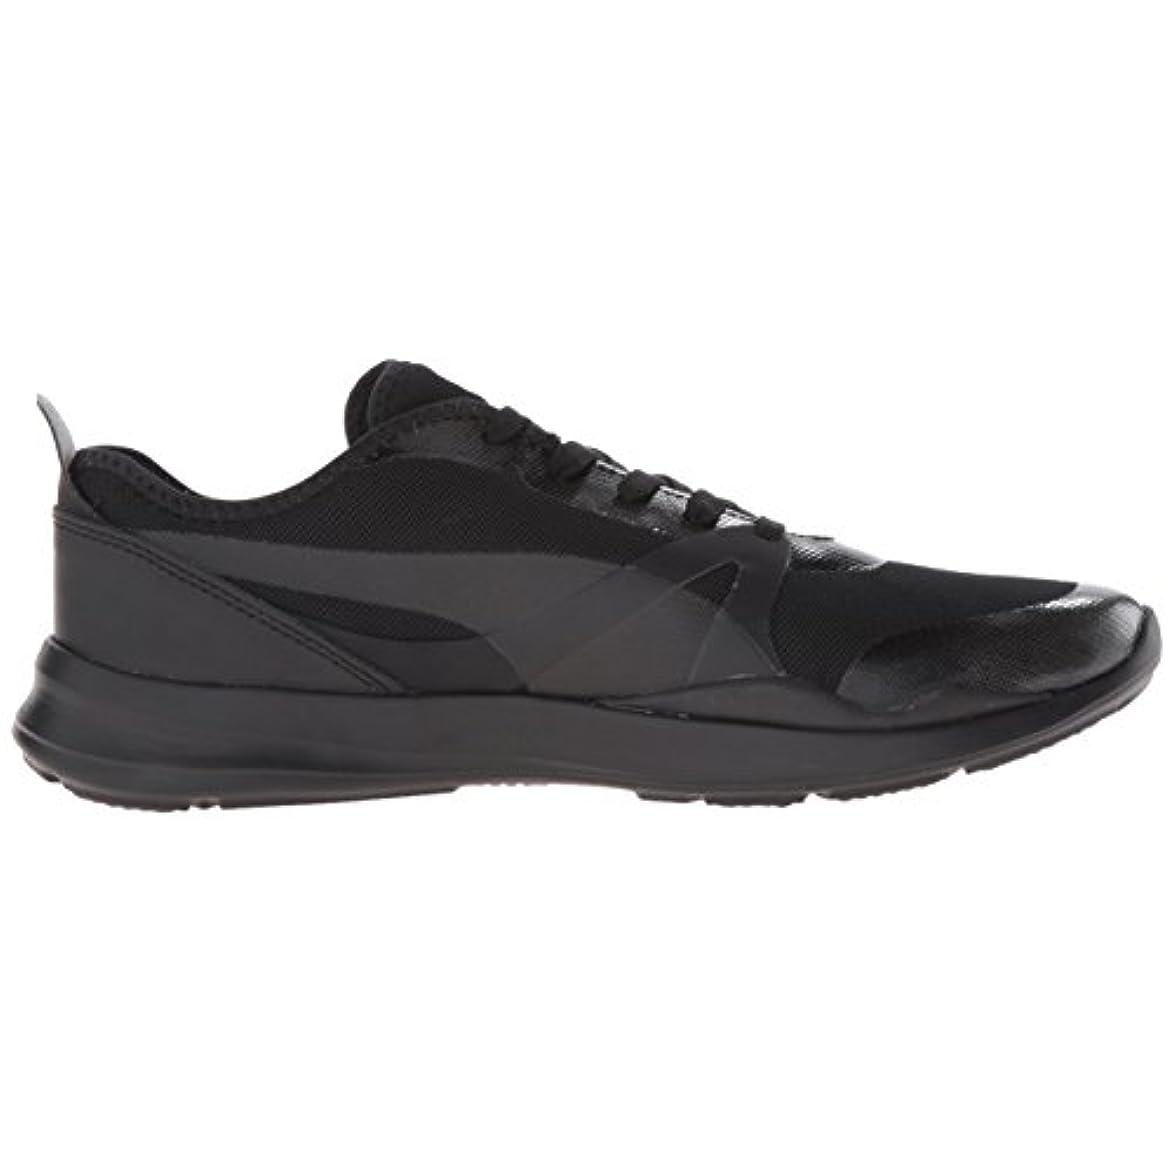 Sneaker Da Donna Duplex Evo Sp Wn's Fashion Puma Black Black 8 5 M Us